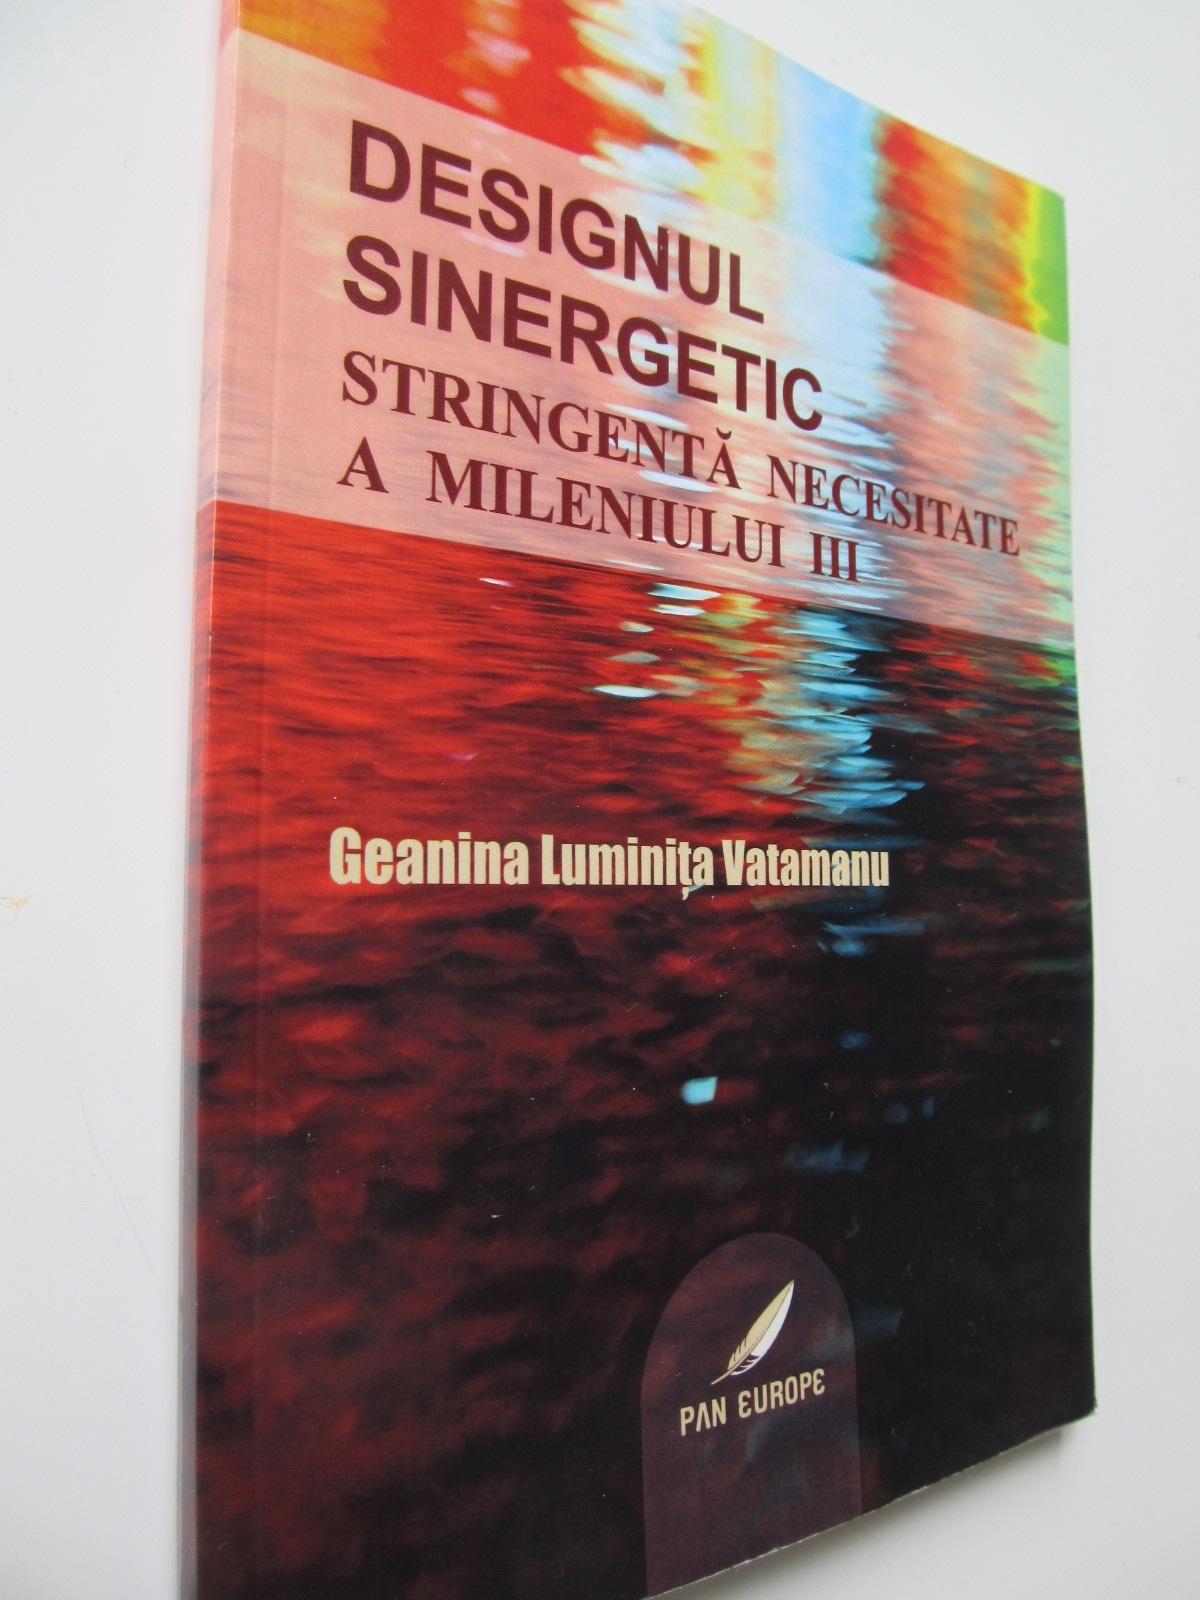 Designul sinergetic stringenta necesitate a mileniului III - Geanina Luminita Vatamanu | Detalii carte